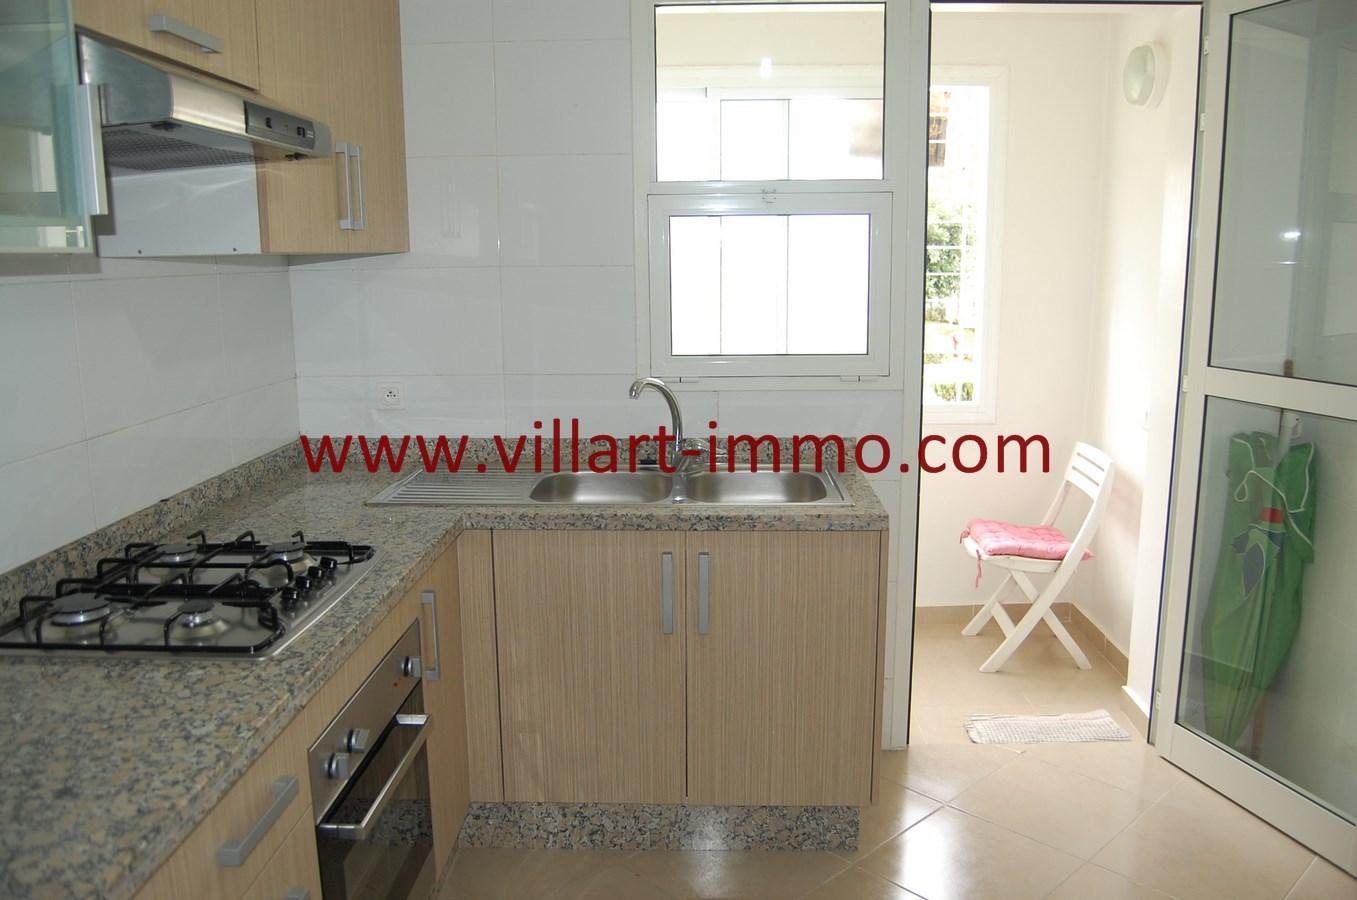 7-Vente-Appartement-Tanger-Route-de-Rabat-Cuisine-VA474-Villart Immo